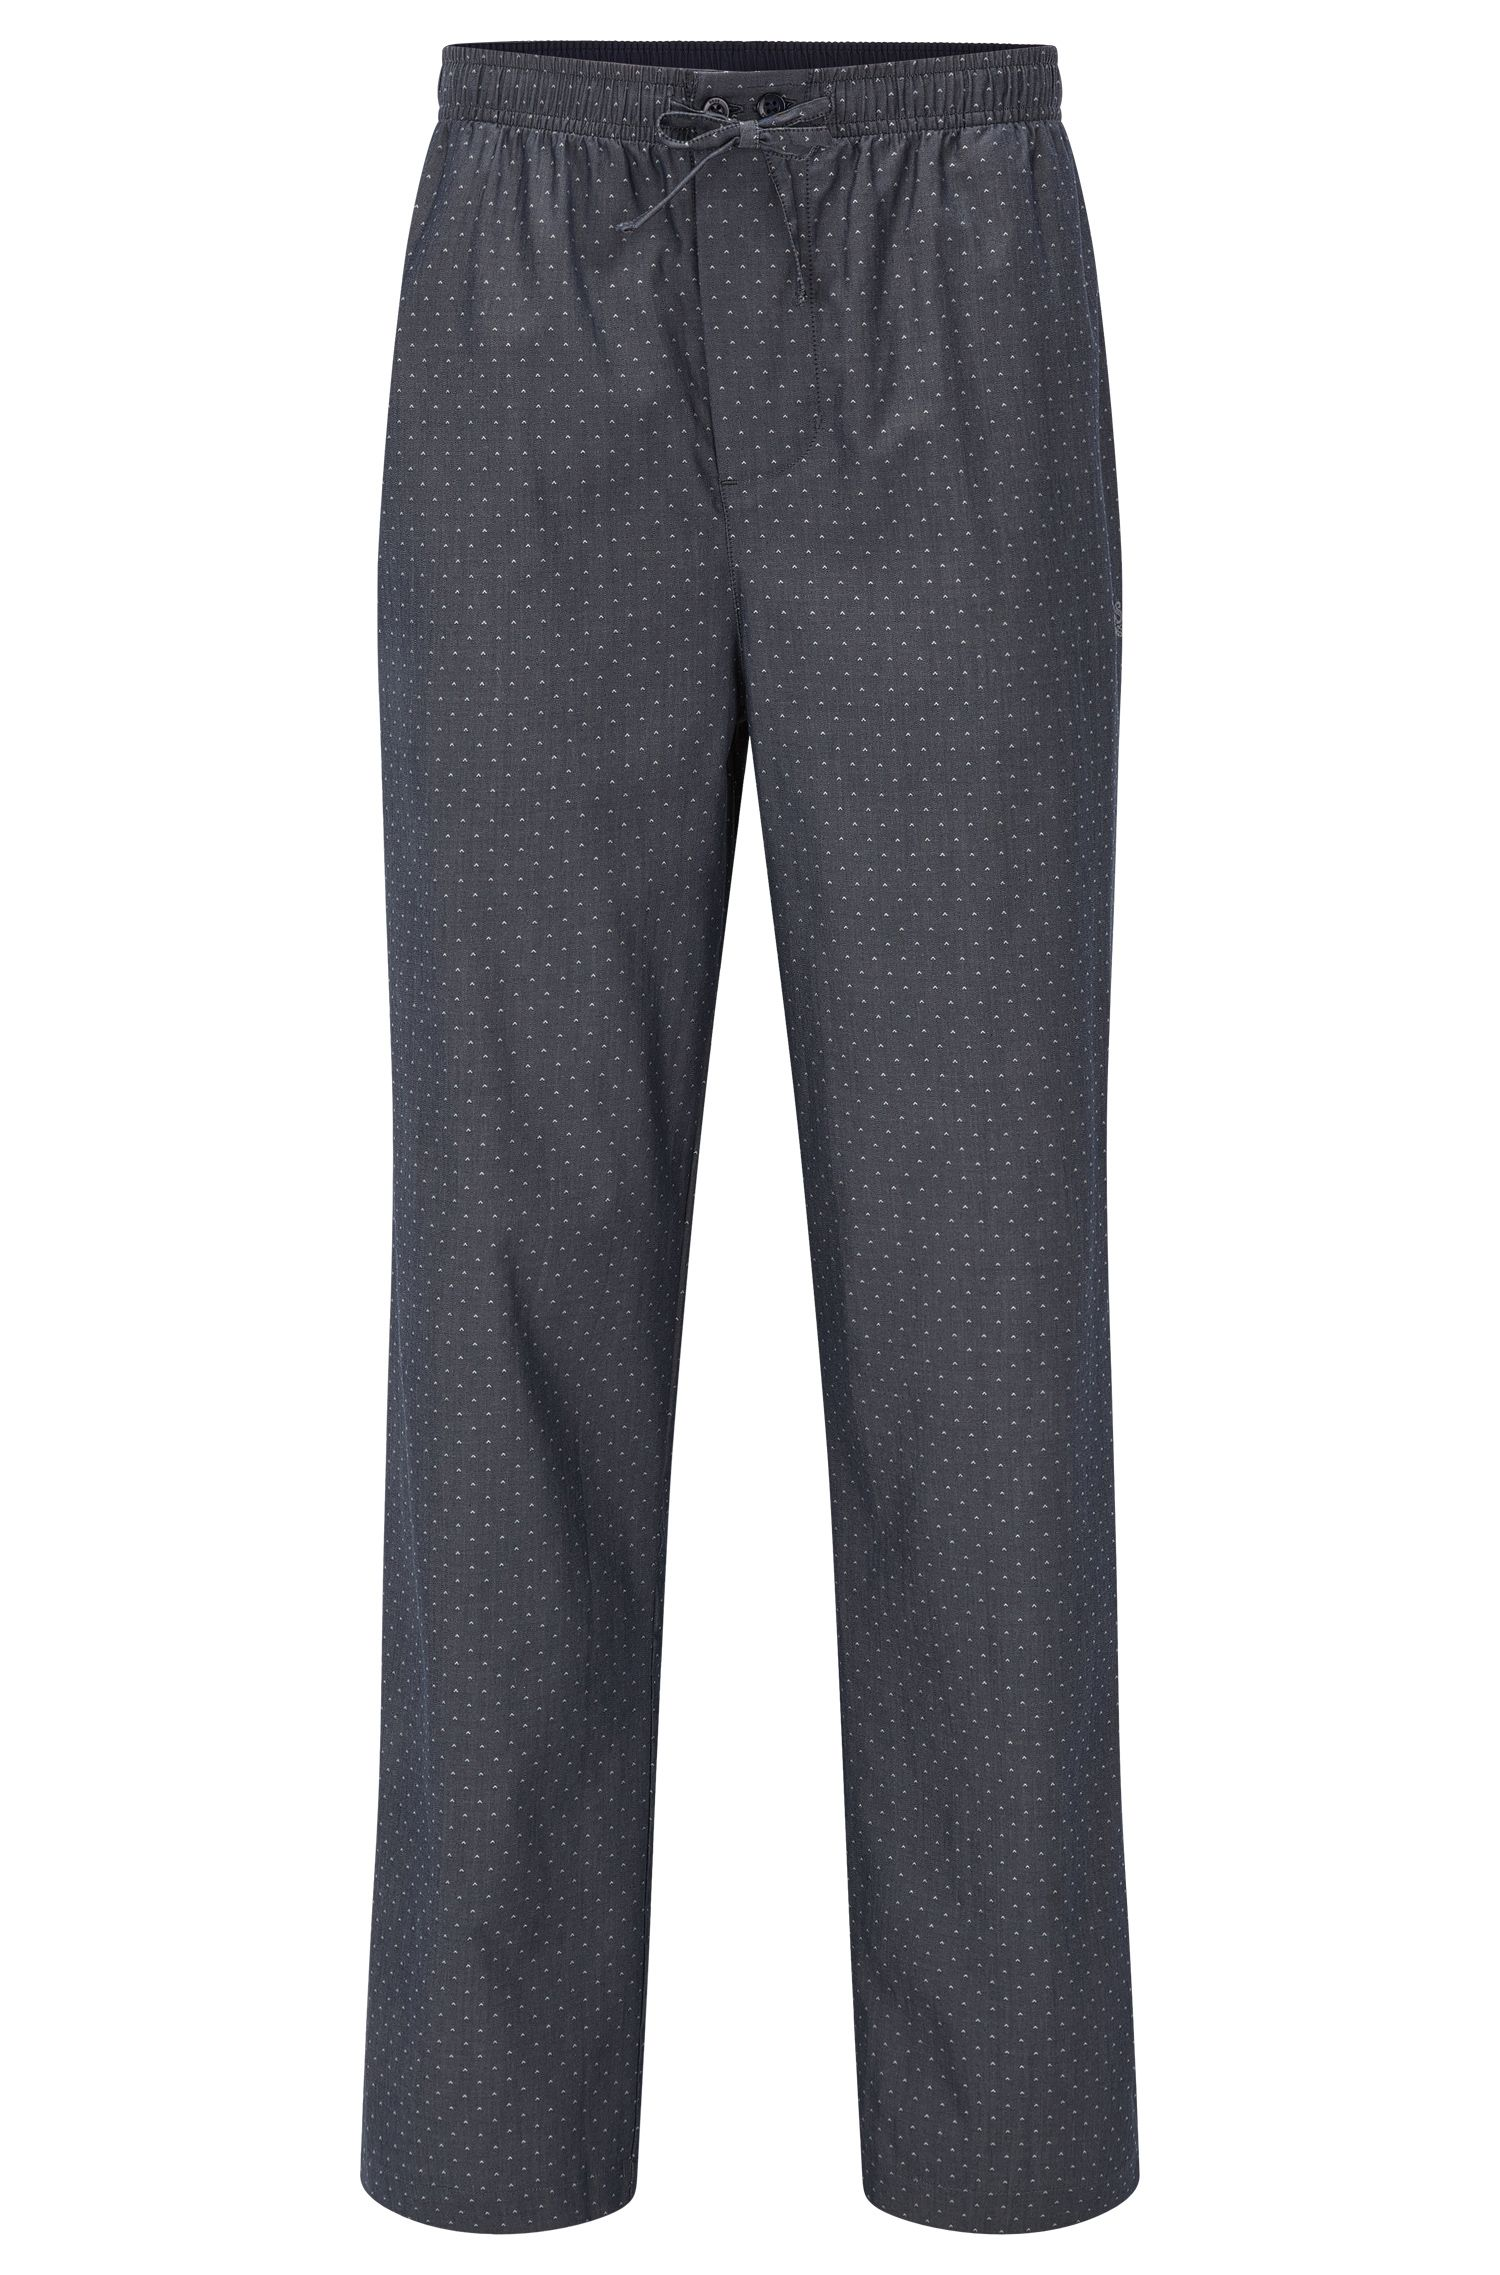 Pyjama bottoms in micro-pattern cotton